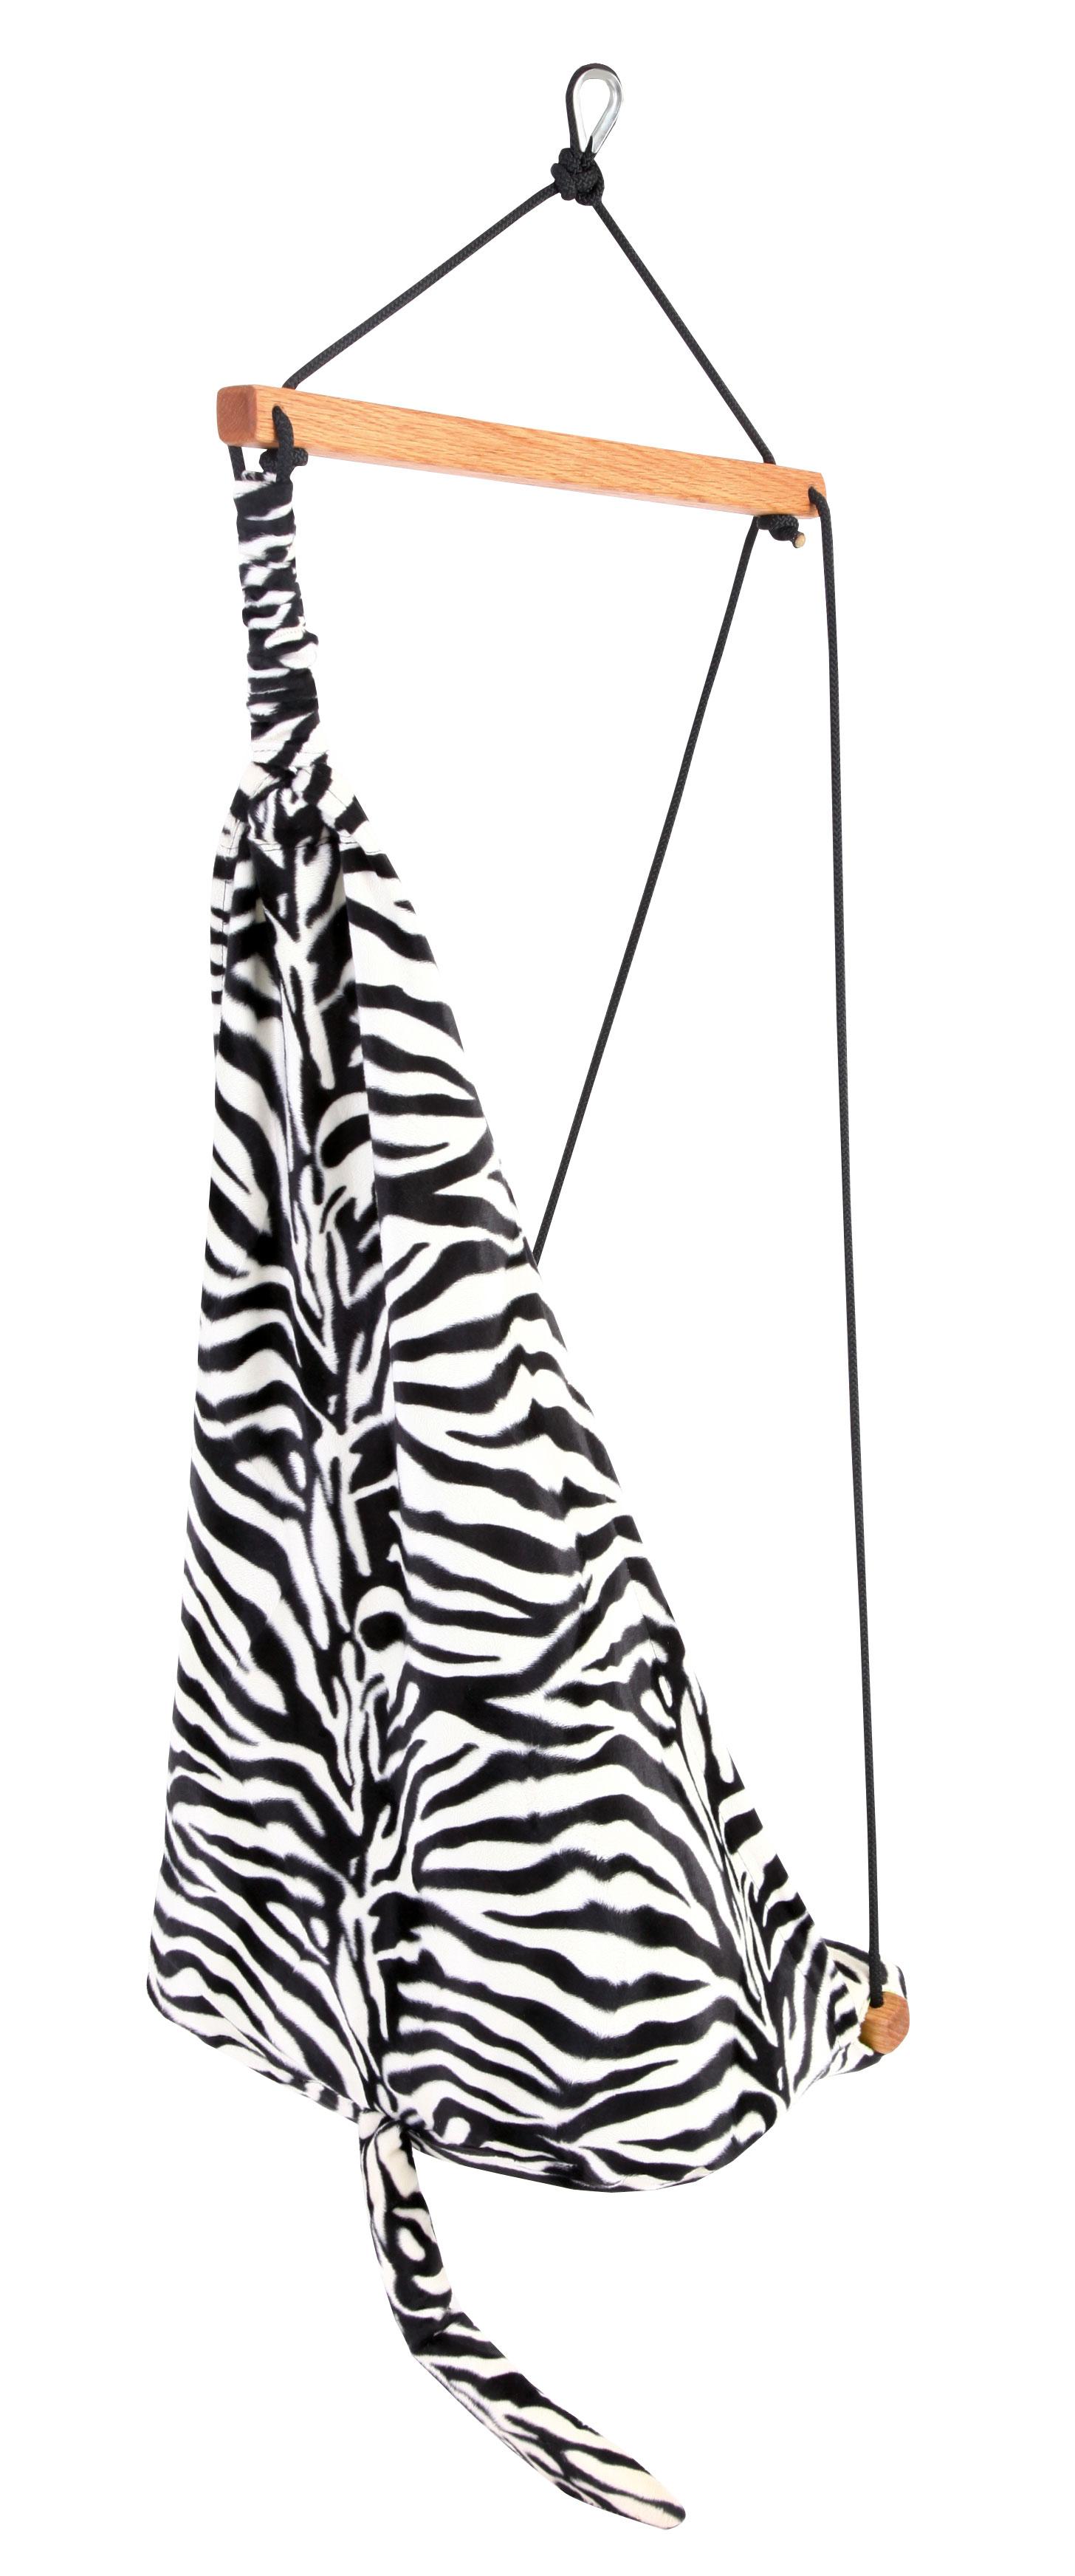 'Hang Mini' Zebra Kinderhangstoel - Groen - Amazonas